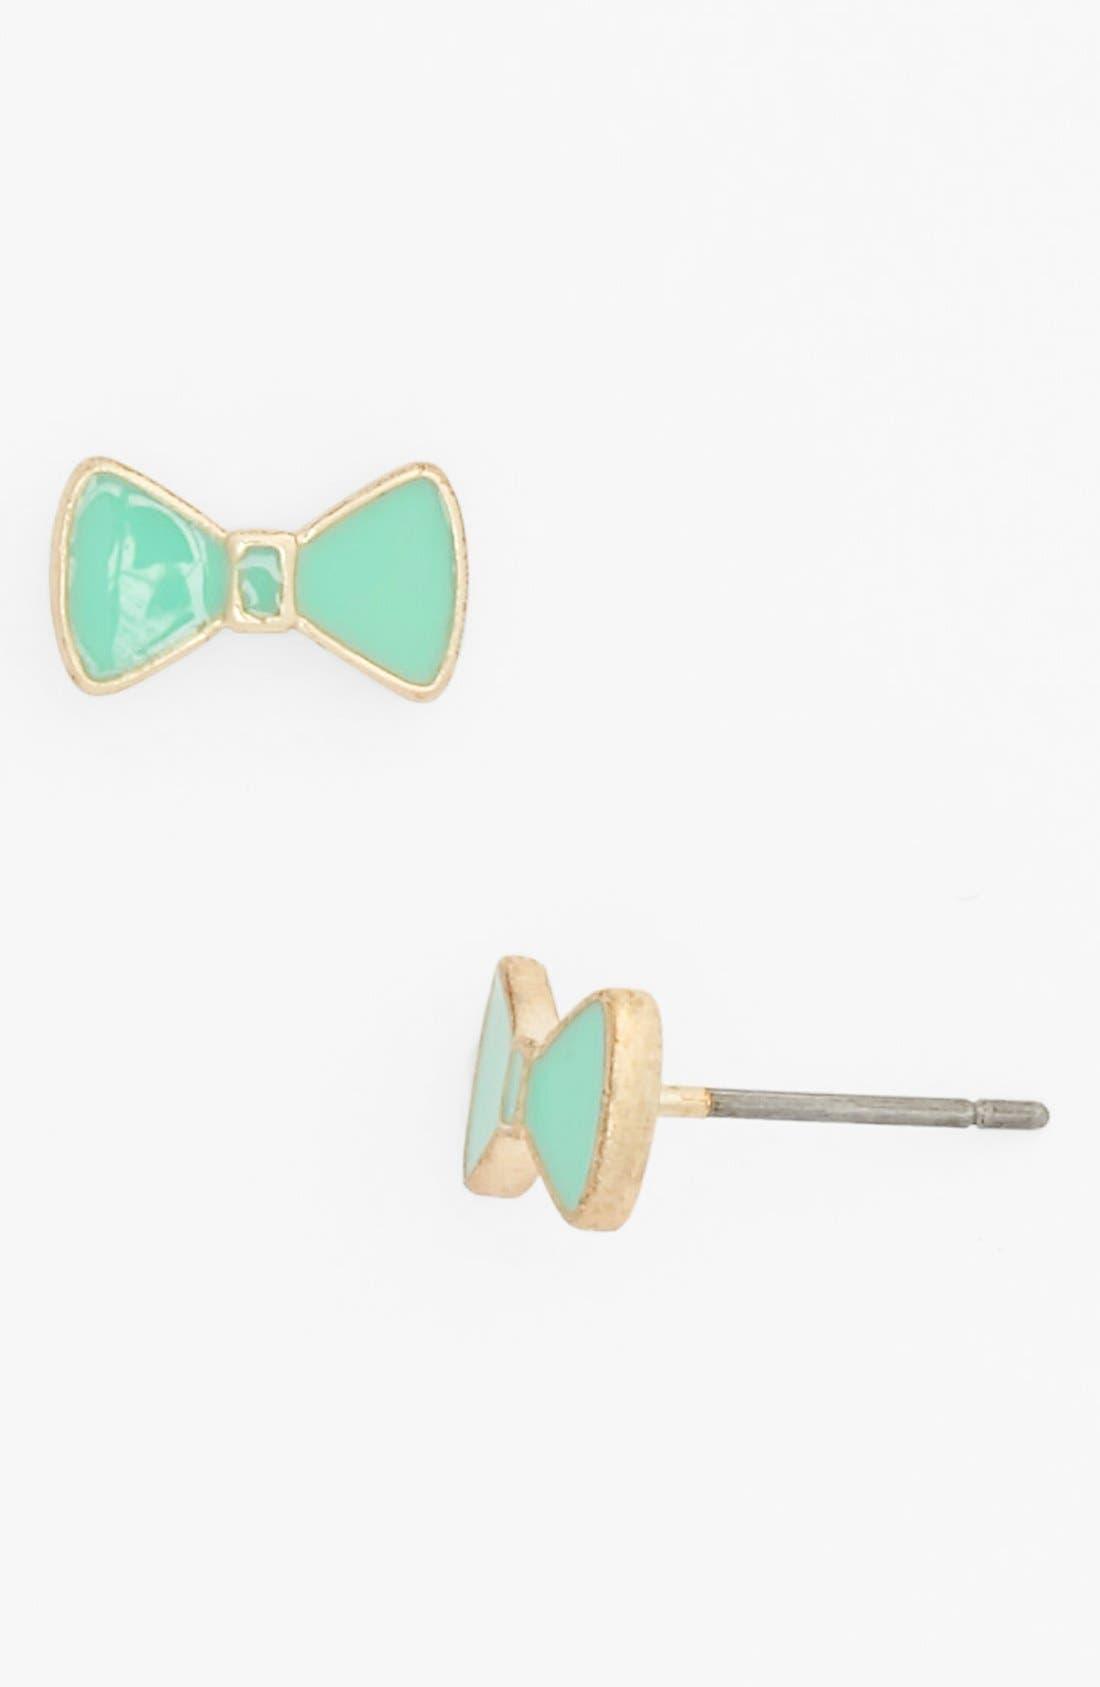 Alternate Image 1 Selected - Rachel Enamel Bow Stud Earrings (Juniors) (Online Only)